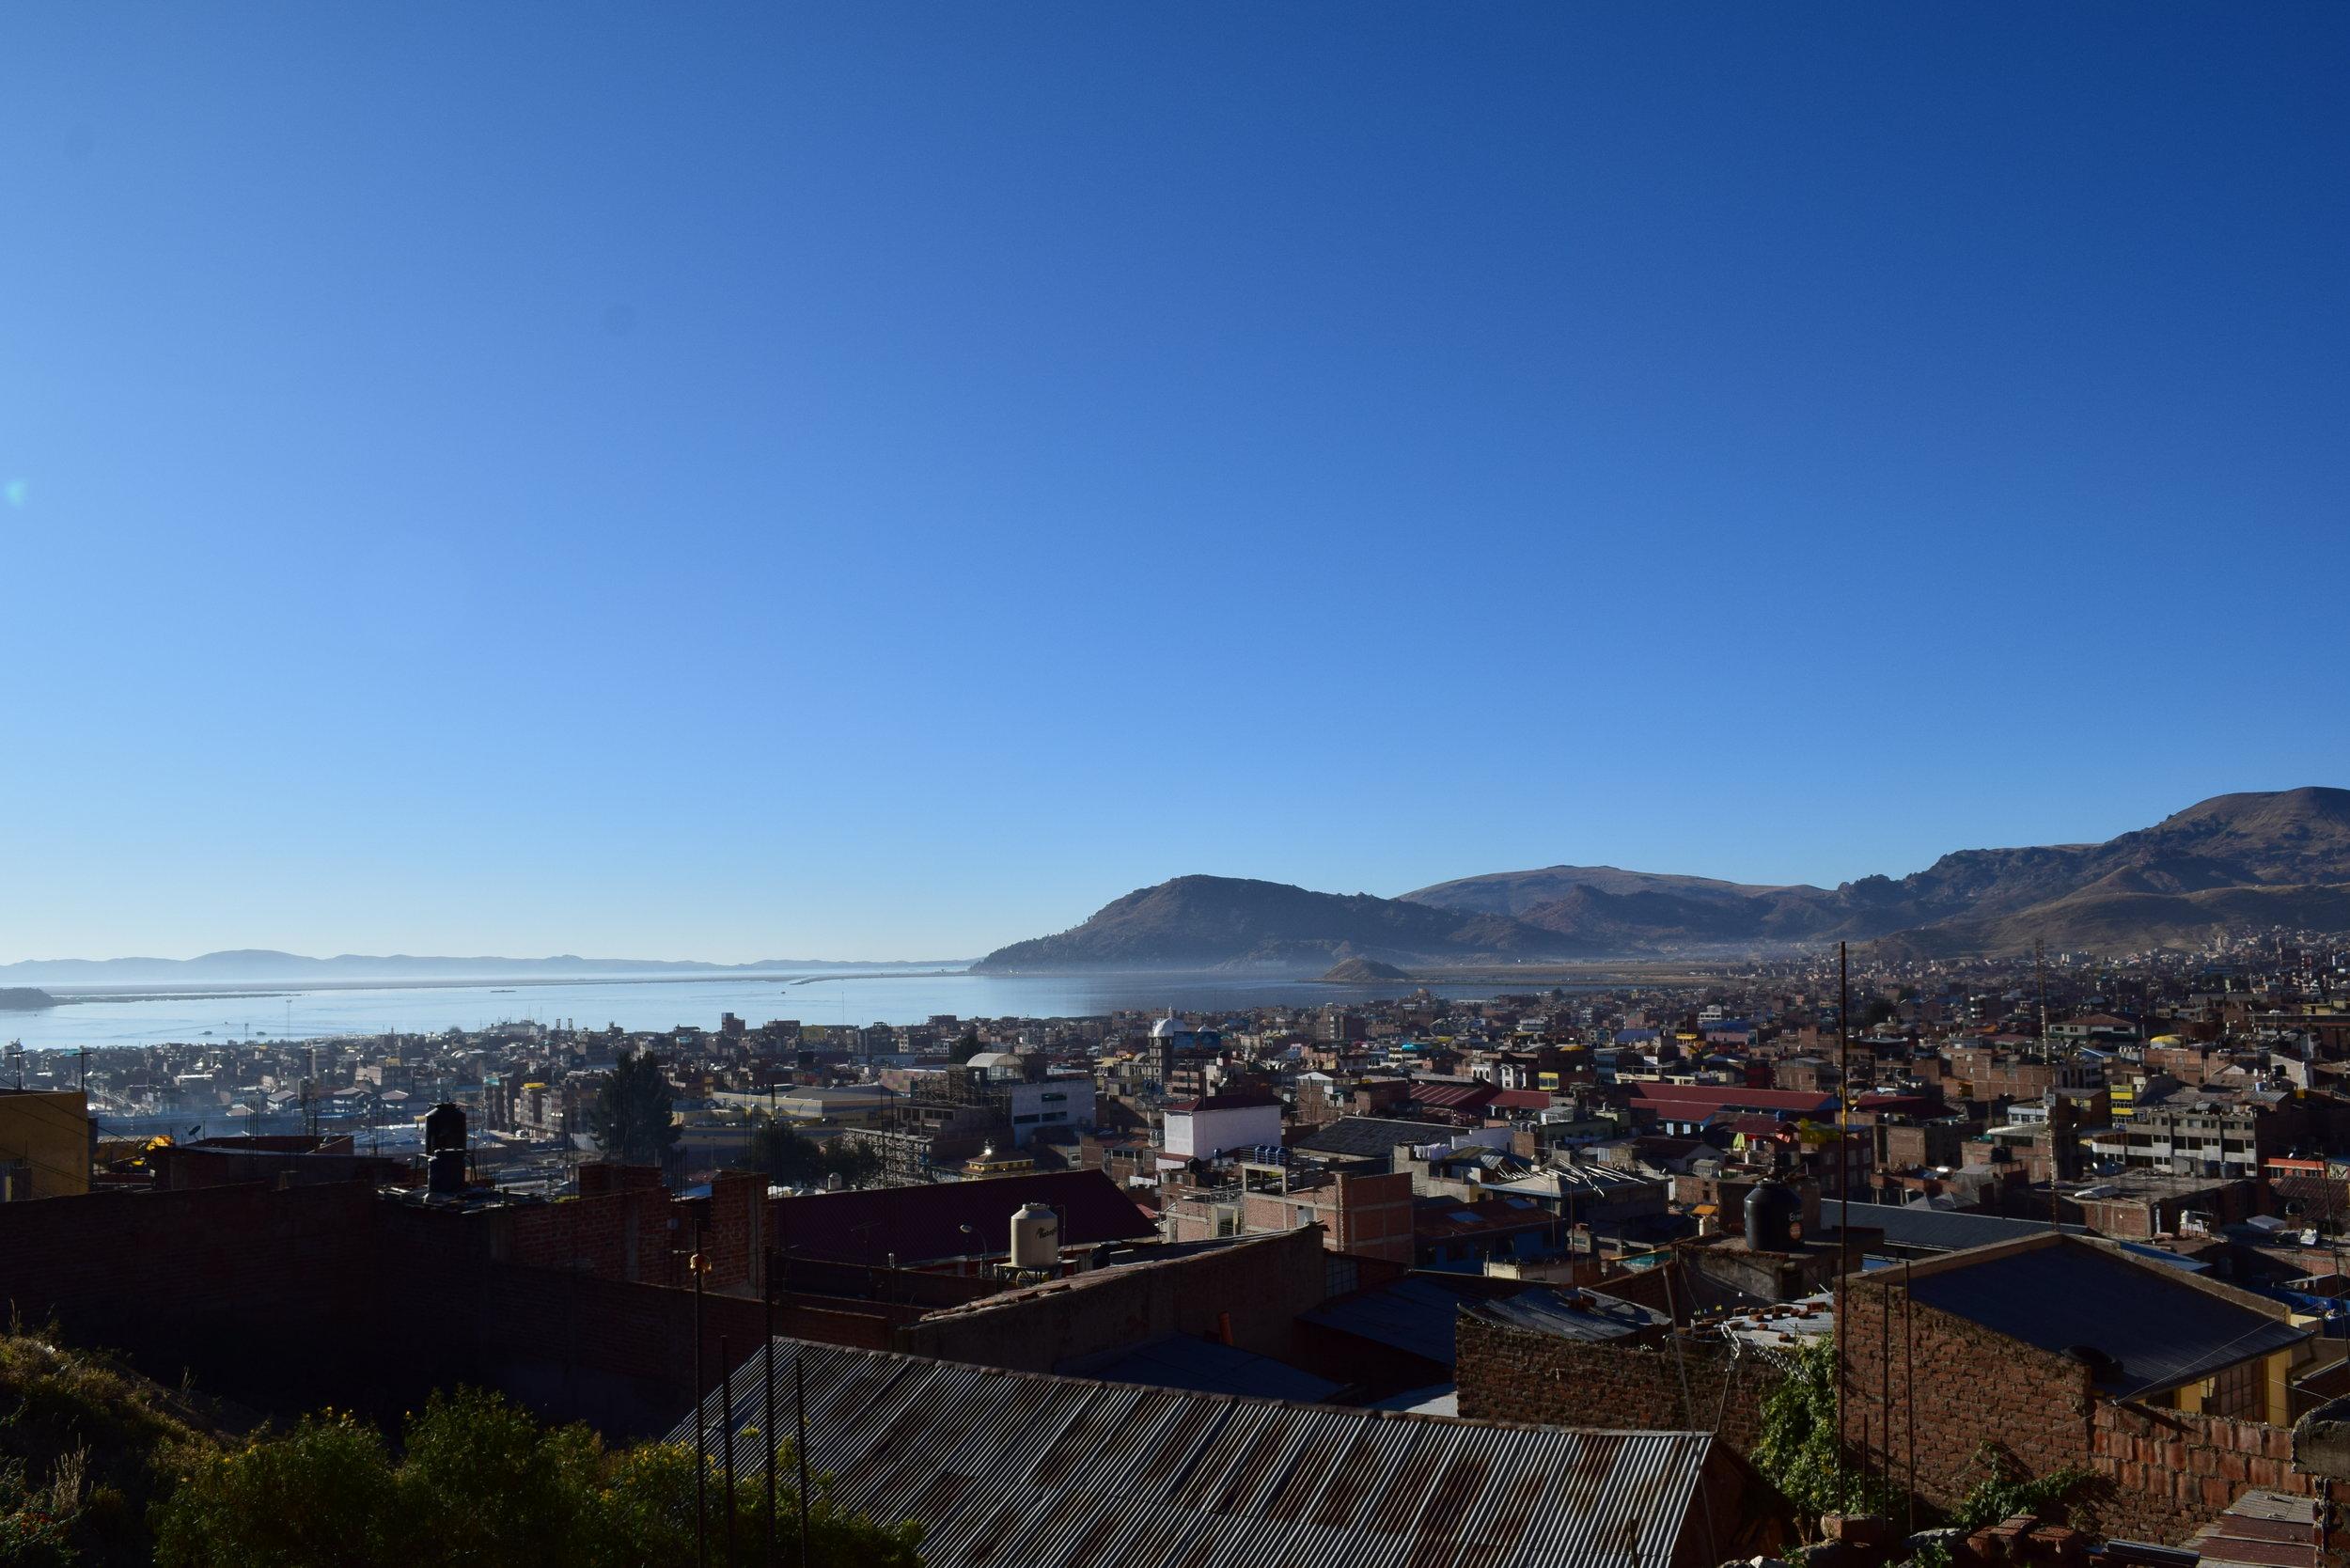 Puno, Peru on the shore of Lake Titicaca.